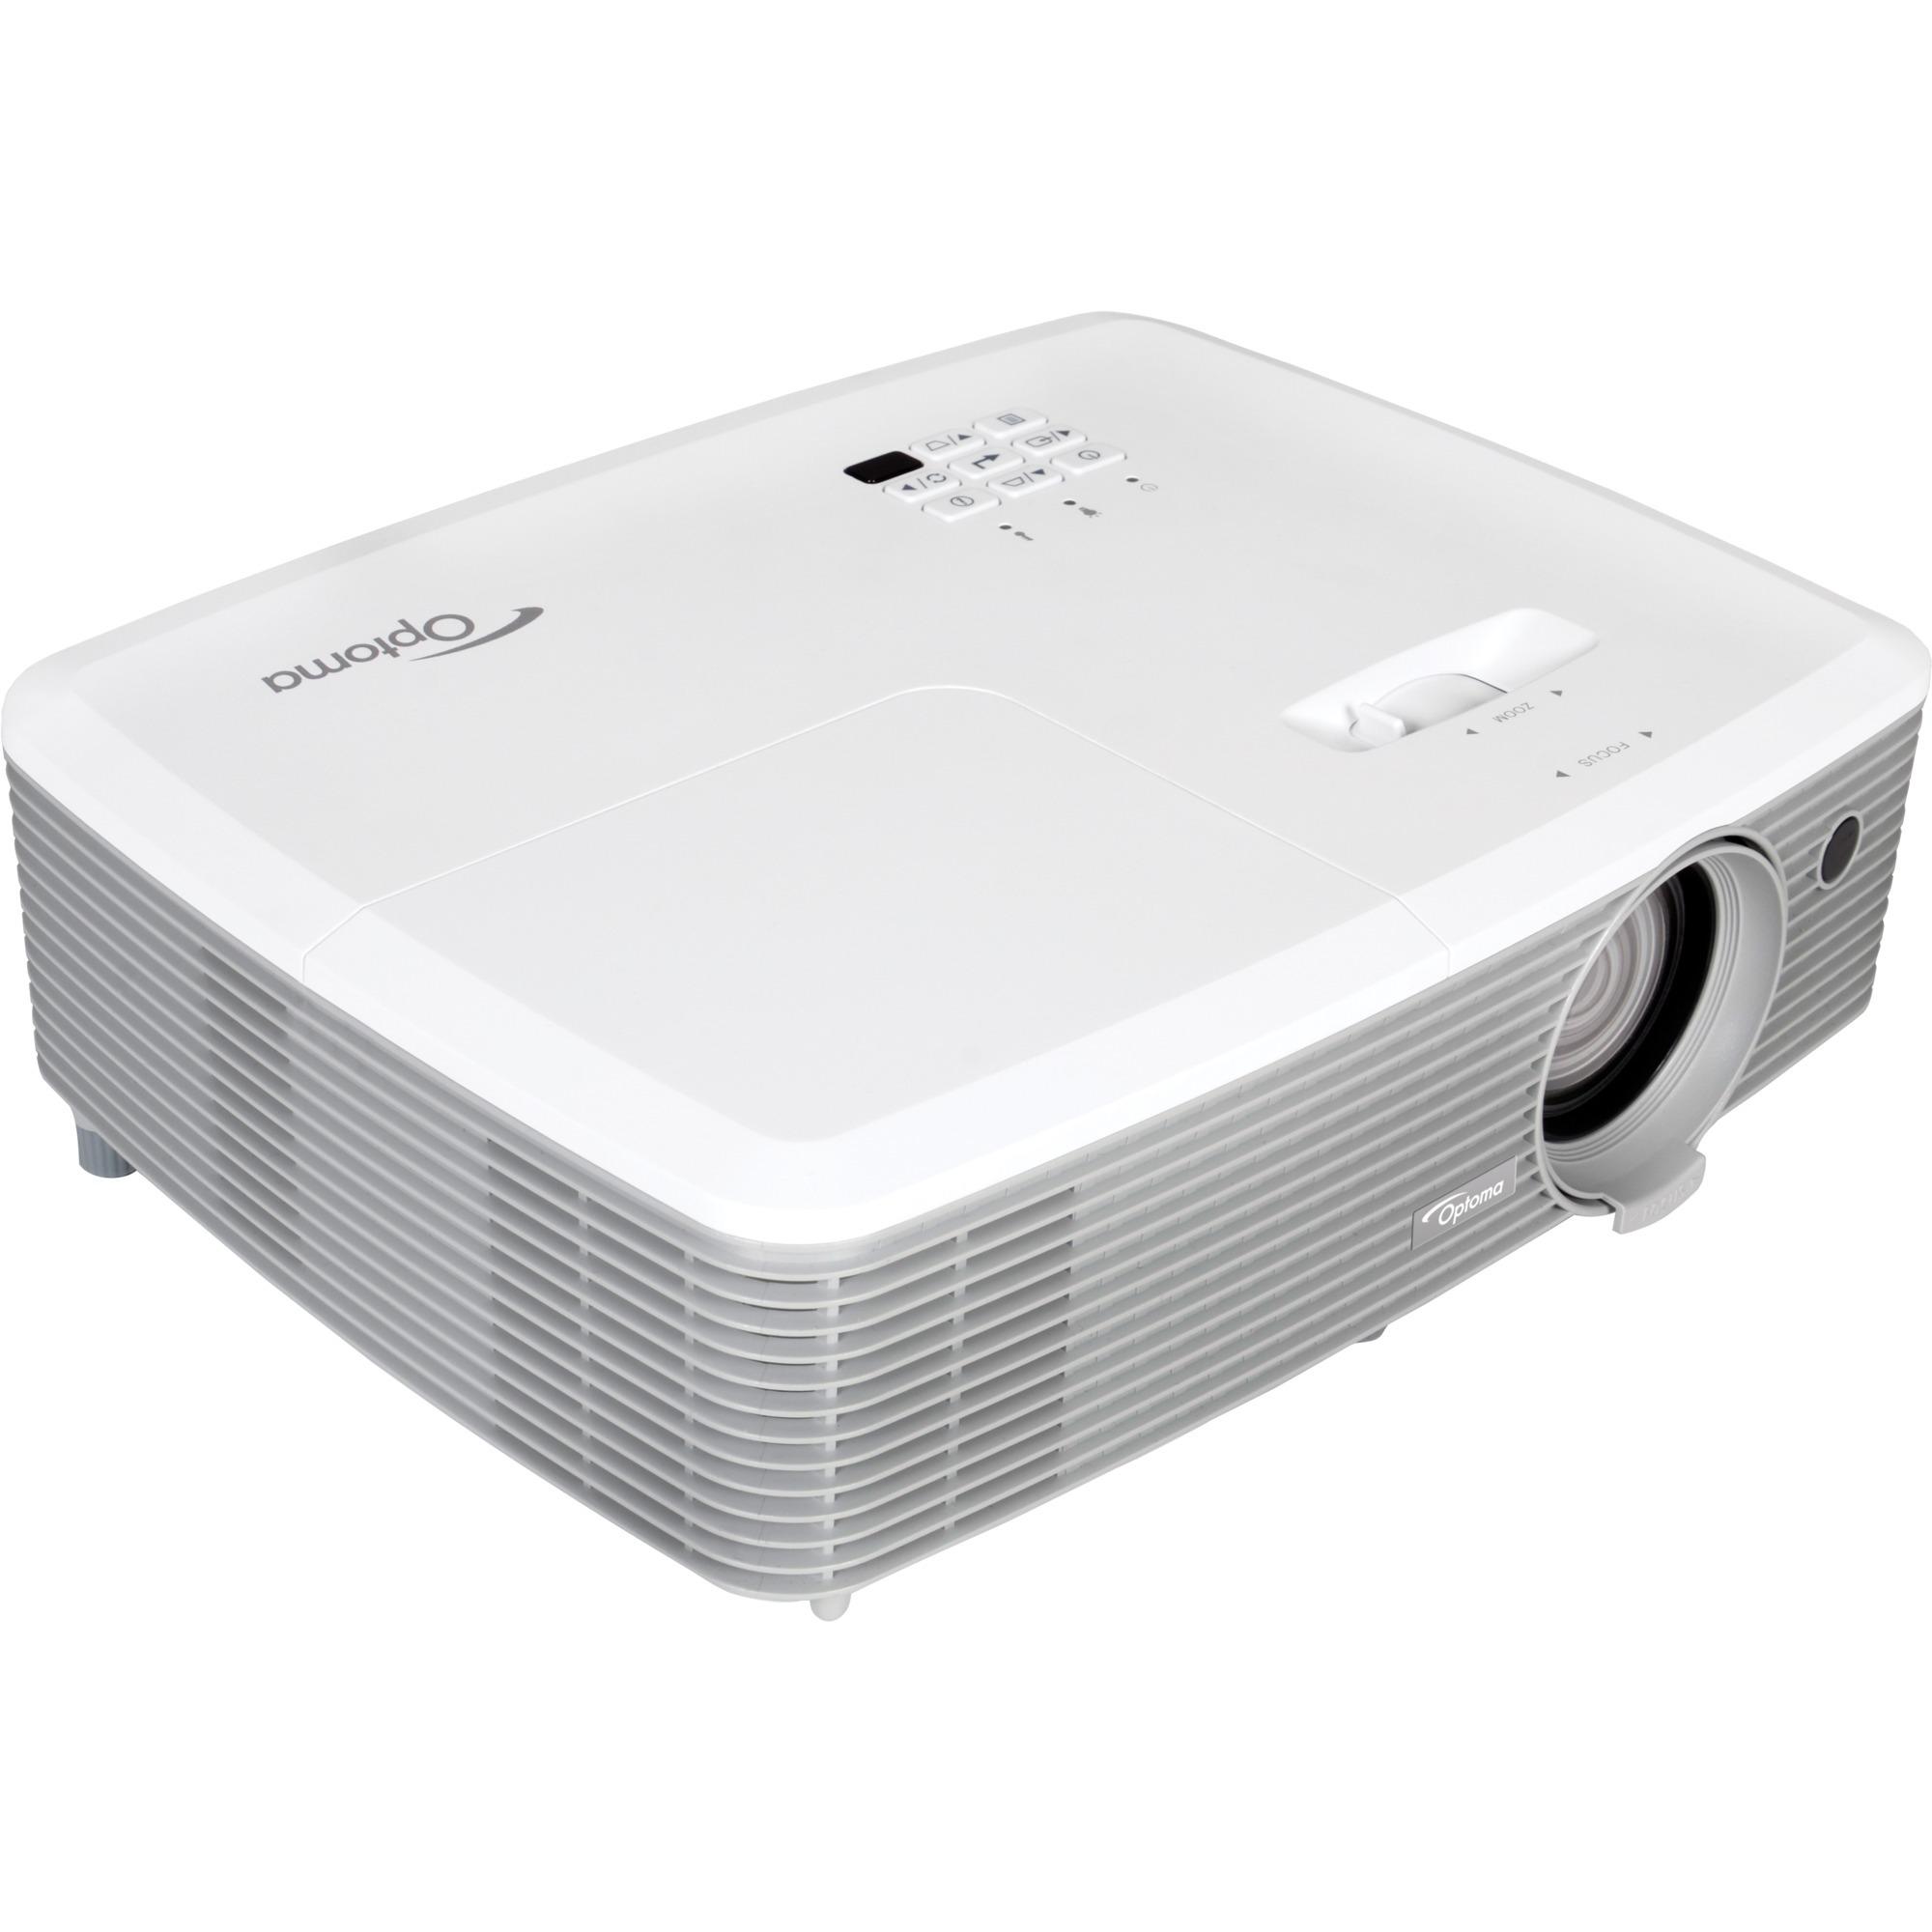 EH400 videoproyector 4000 lúmenes ANSI DLP 1080p (1920x1080) 3D Proyector portátil Gris, Proyector DLP